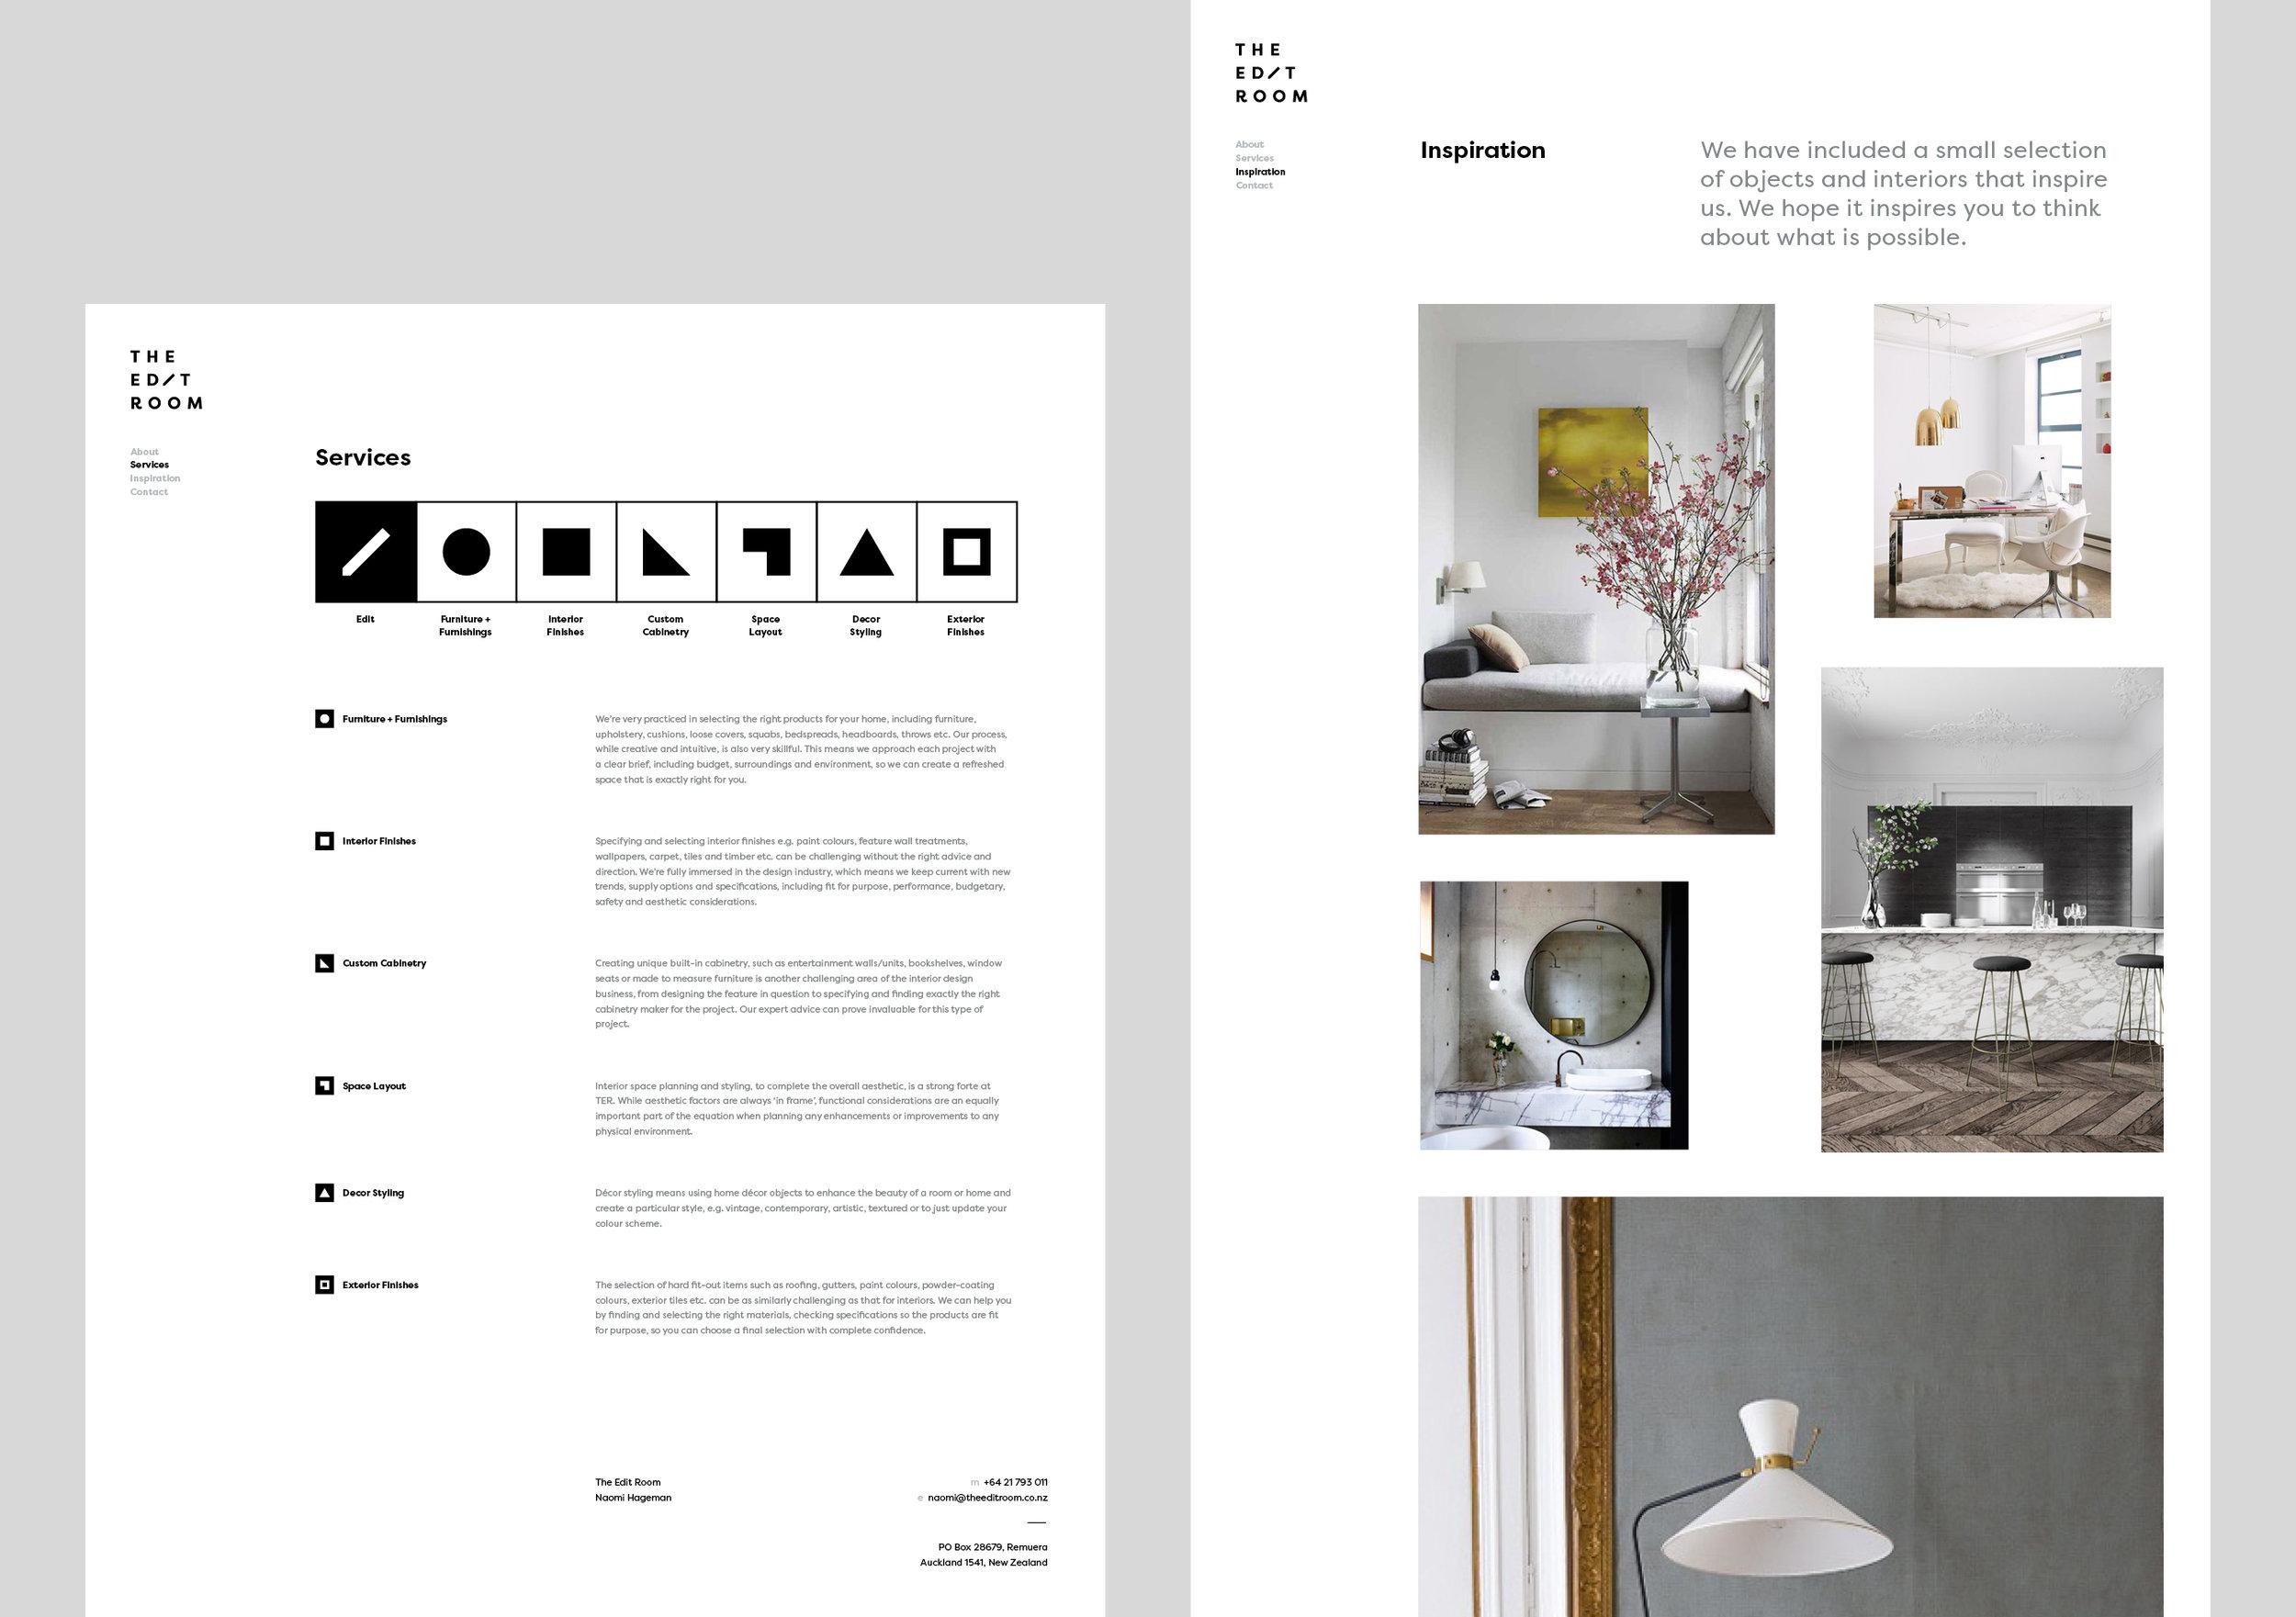 Marque_The_Edit_Room_8.jpg